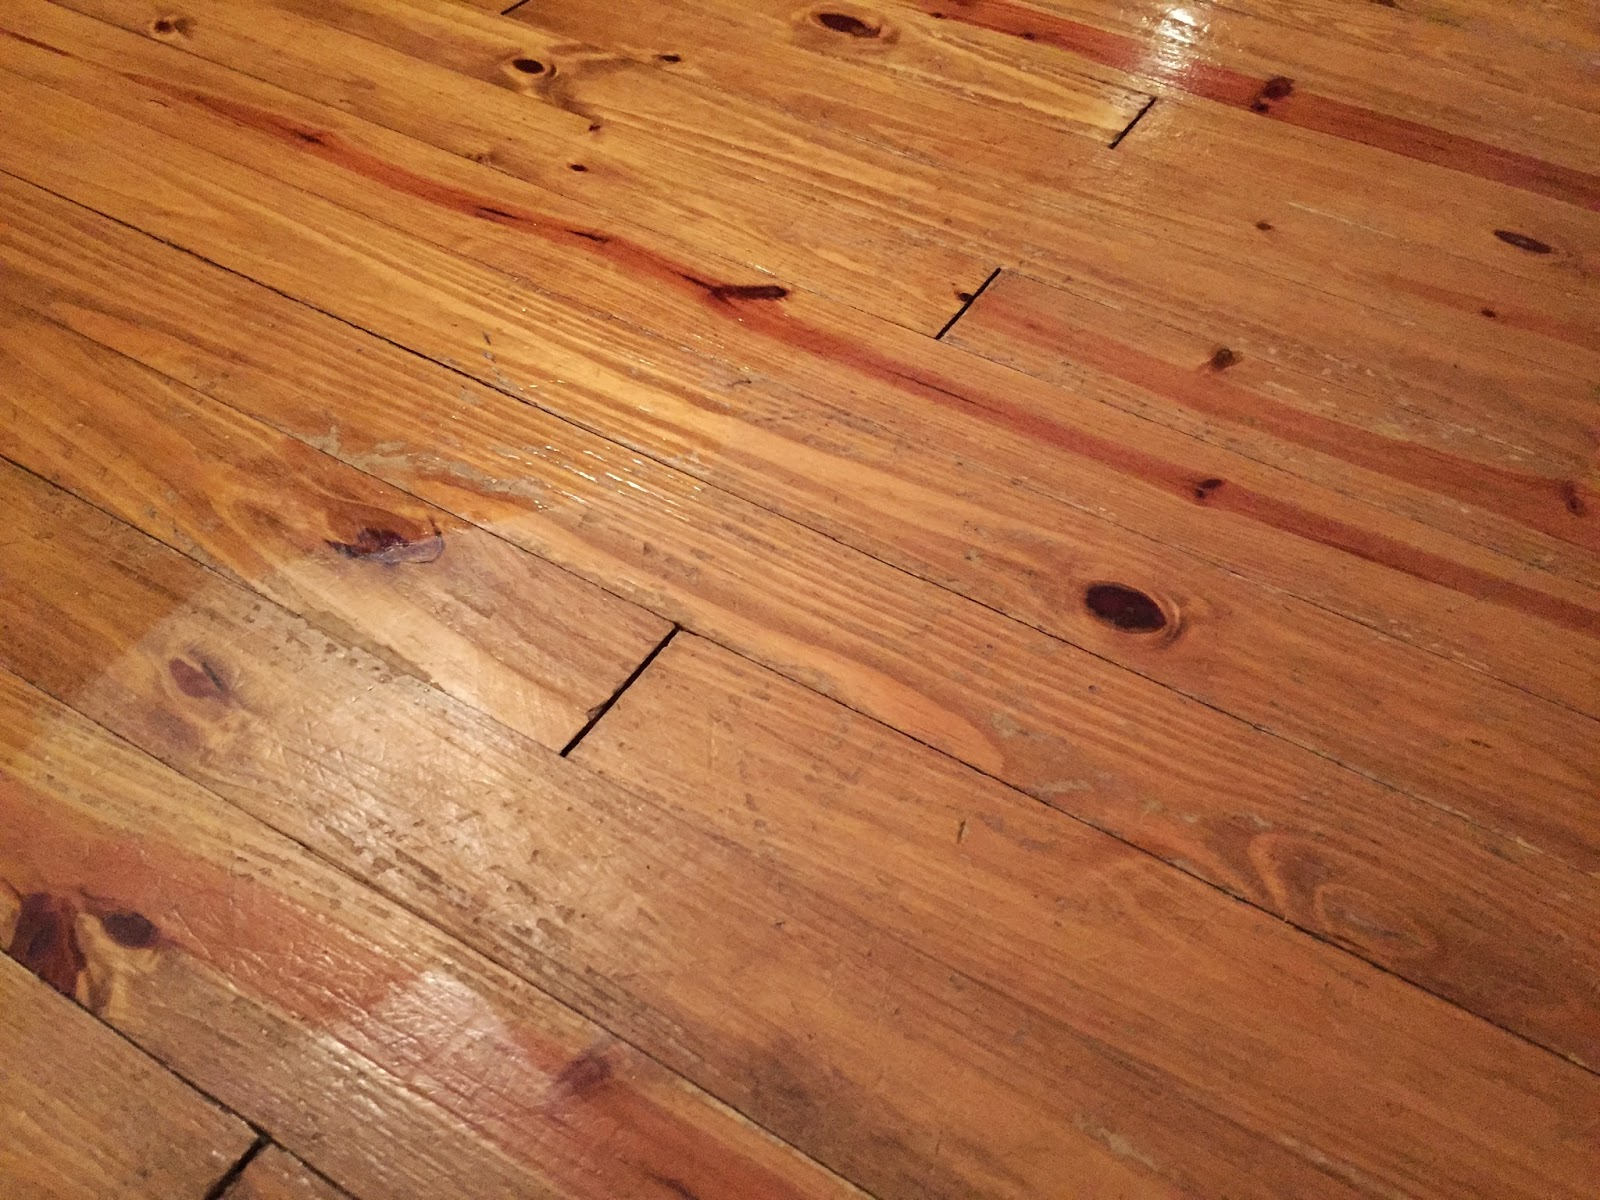 Thrifty farmer 39 s wife my hardwood floors lost their shine for Hardwood floors not shiny